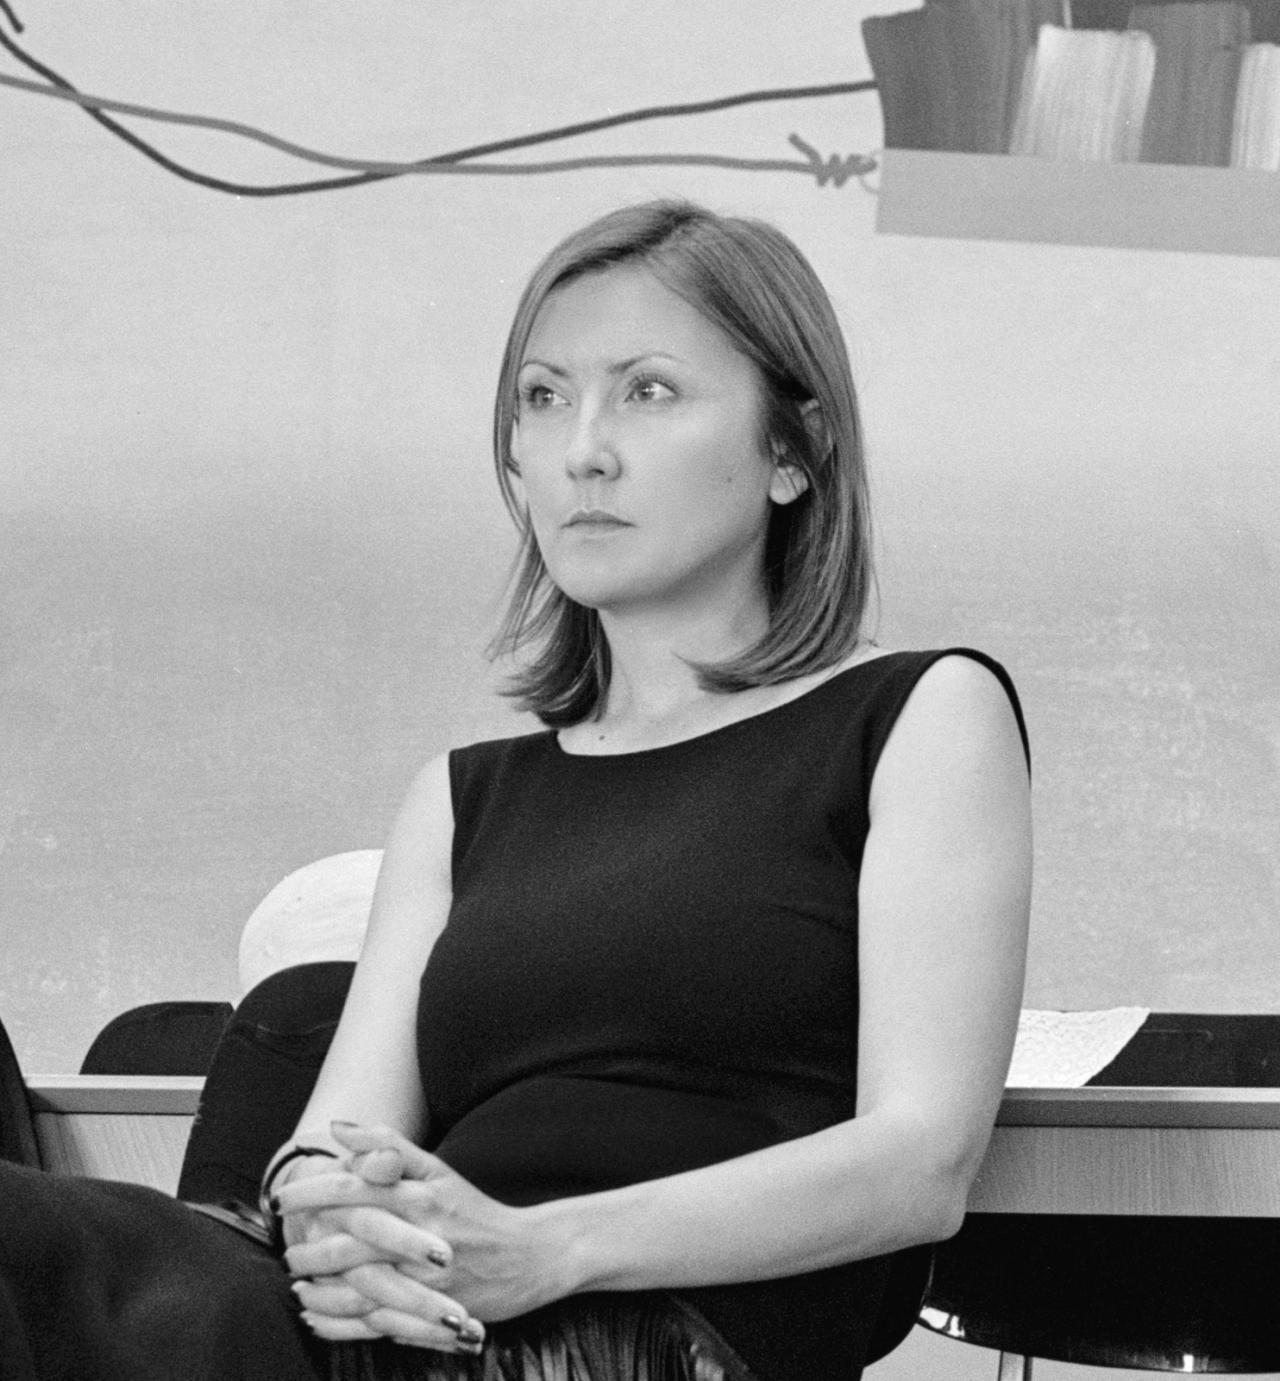 Olga Temnikova; Photo: Dmitri Gerassimov